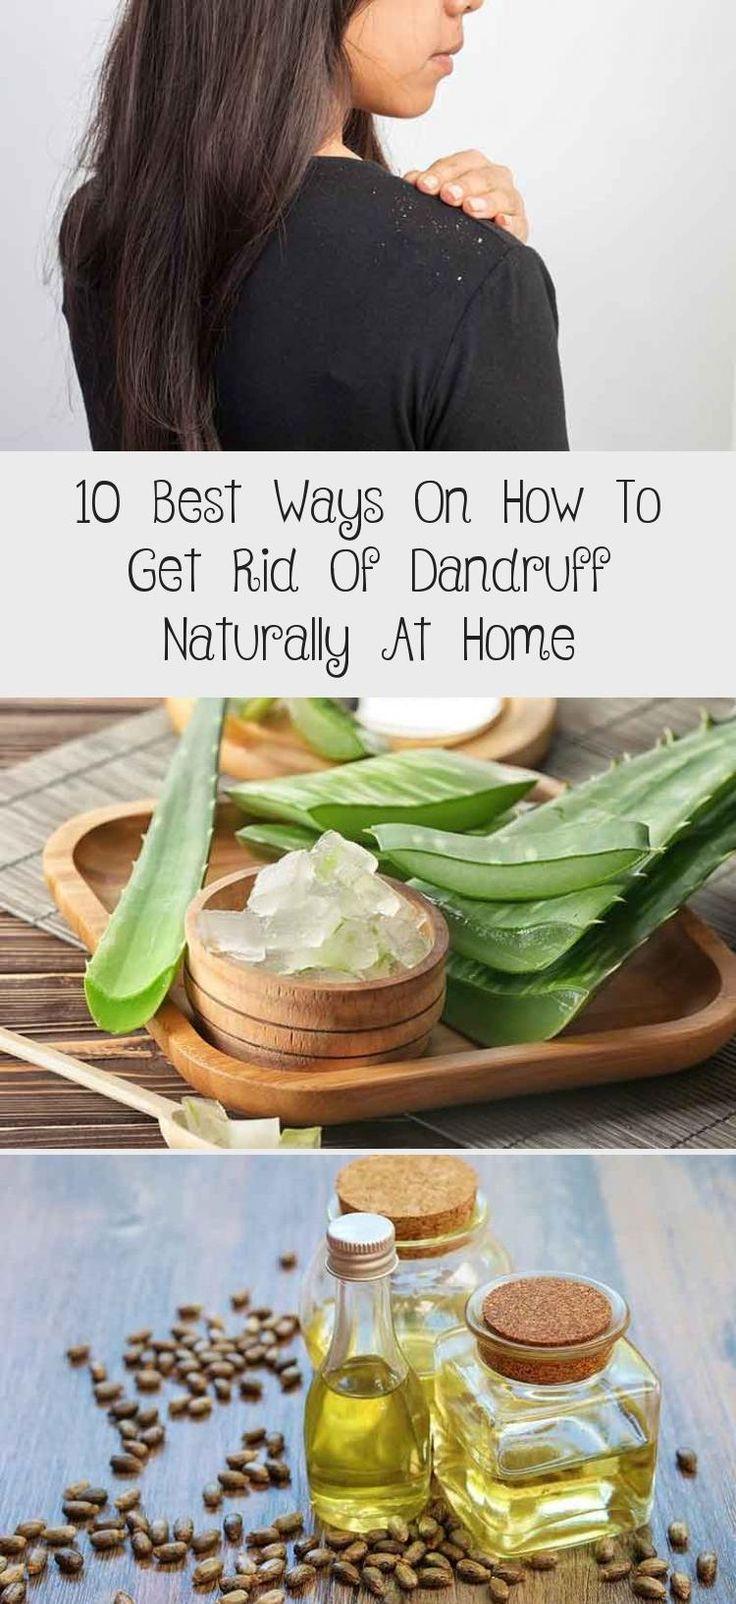 how to get rid of dandruff men's health